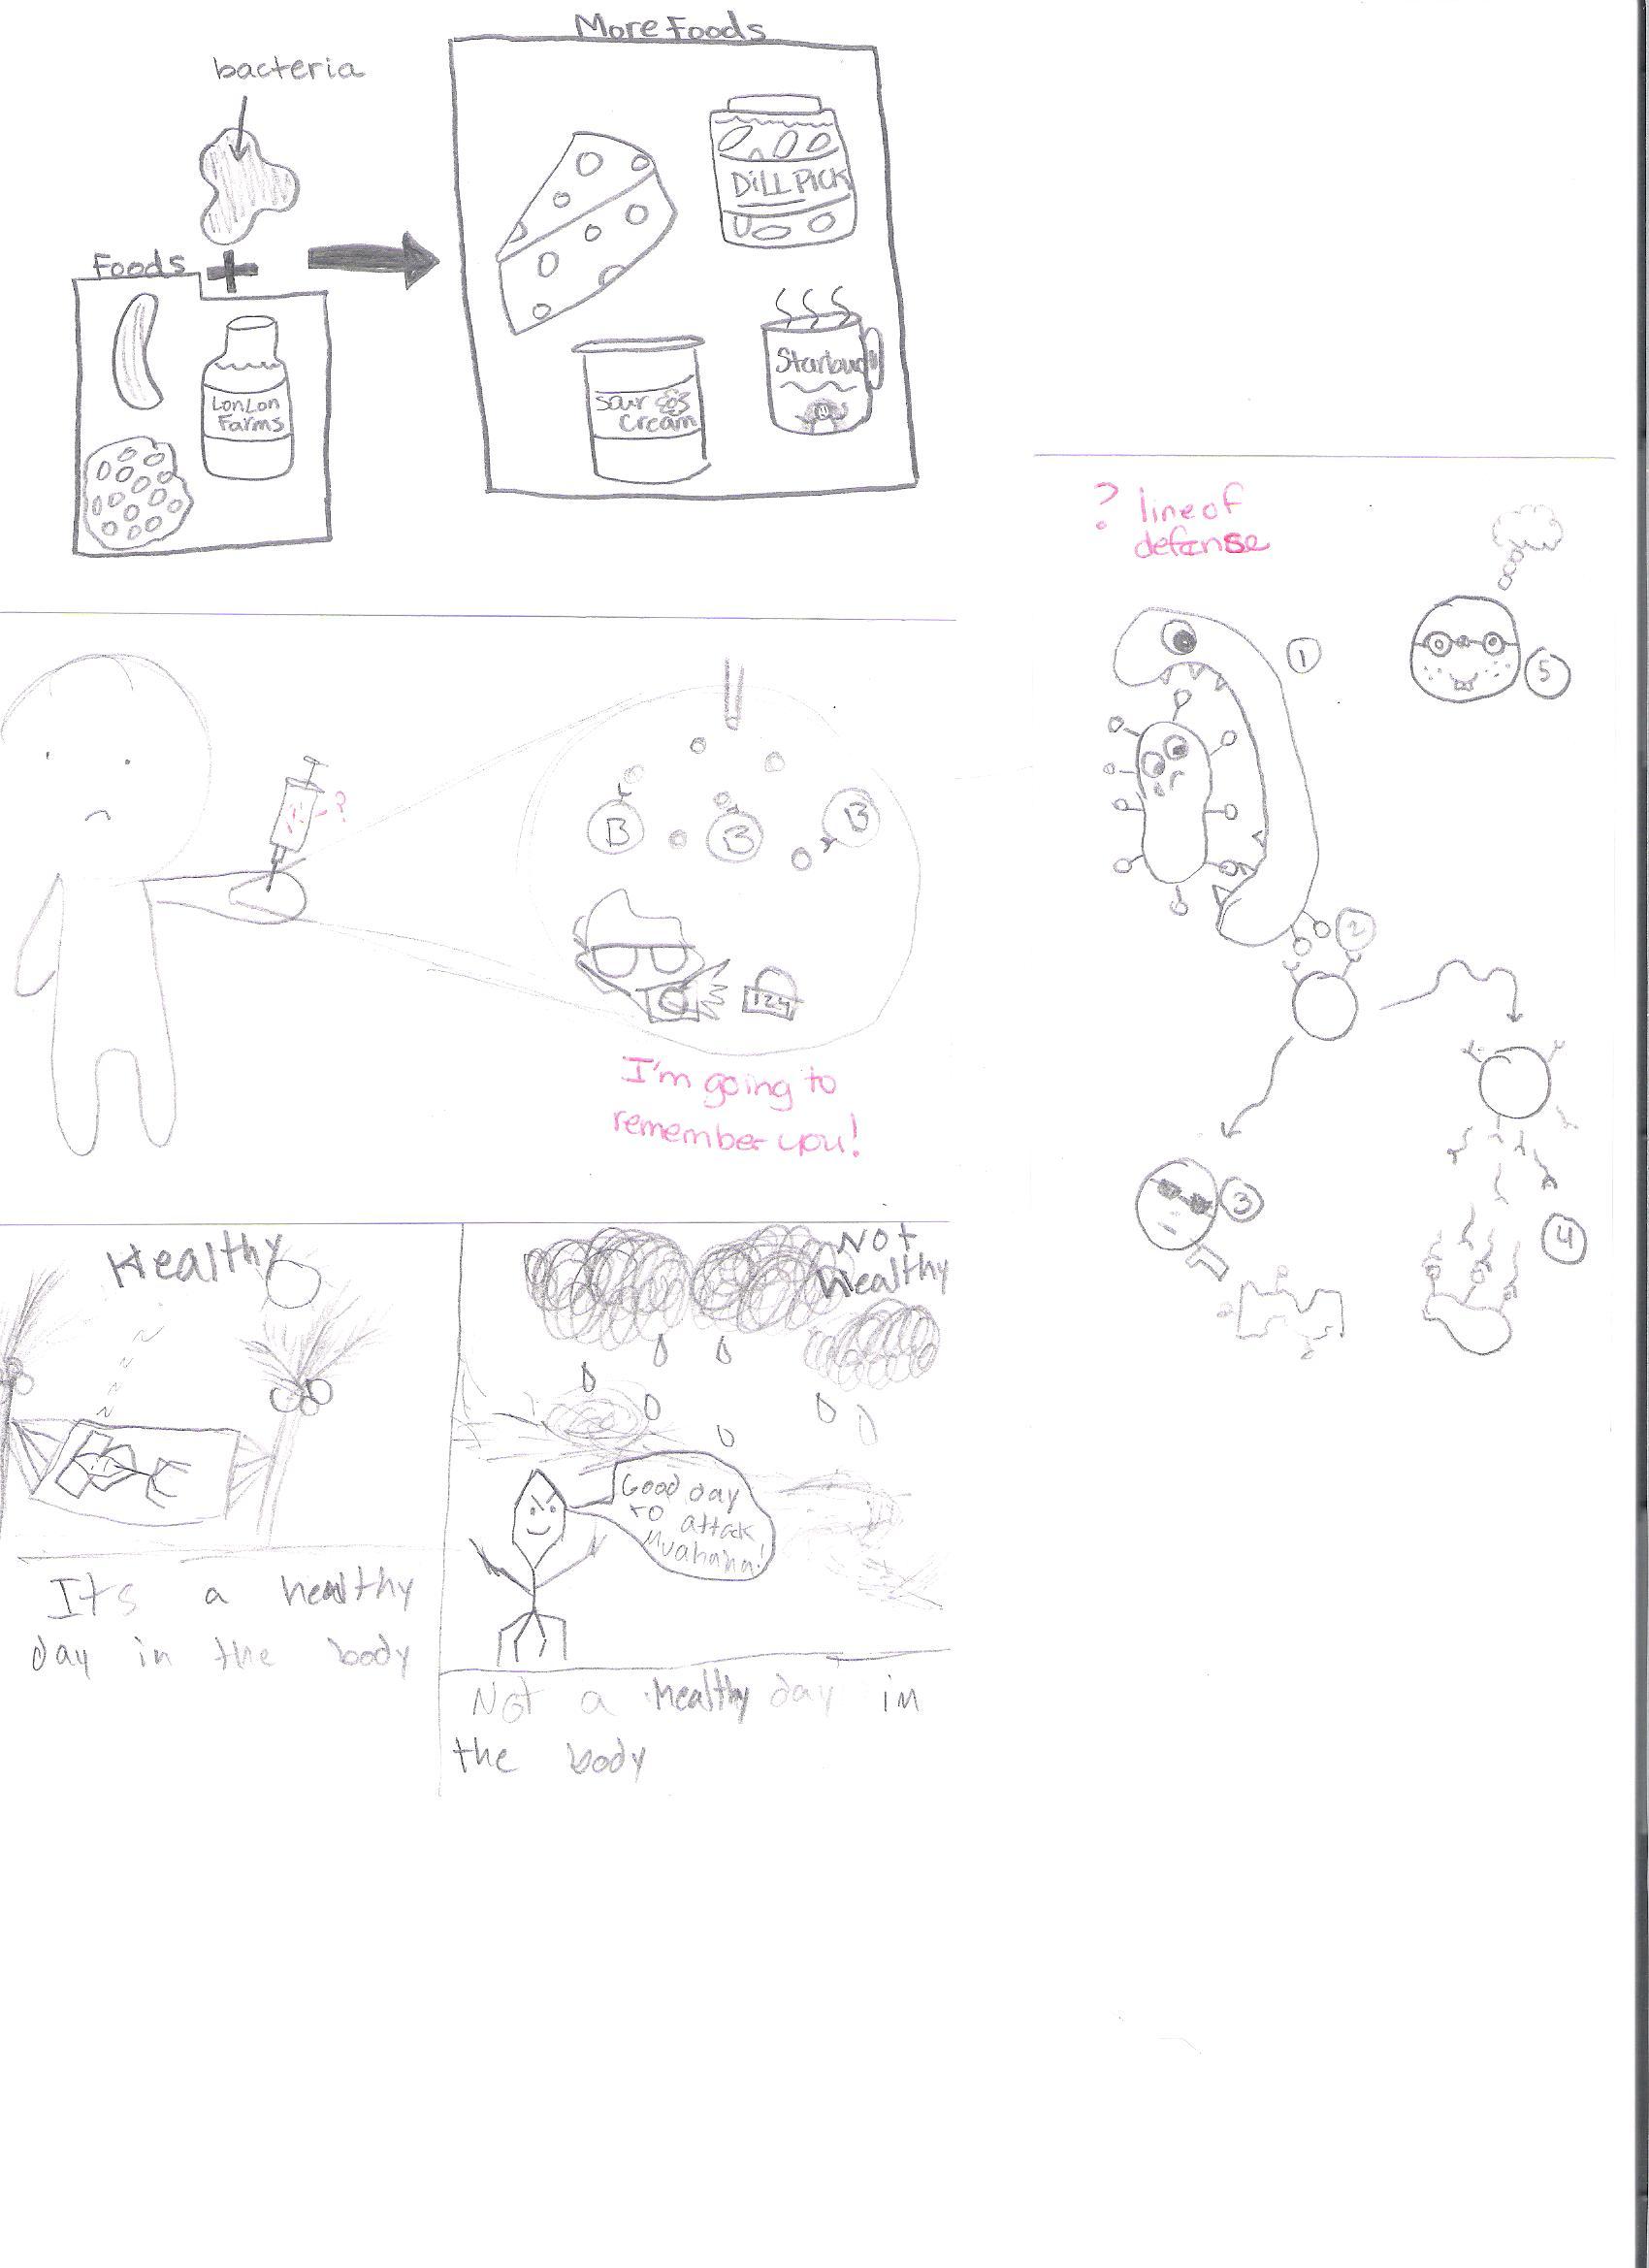 microscope drawing worksheet at getdrawings com